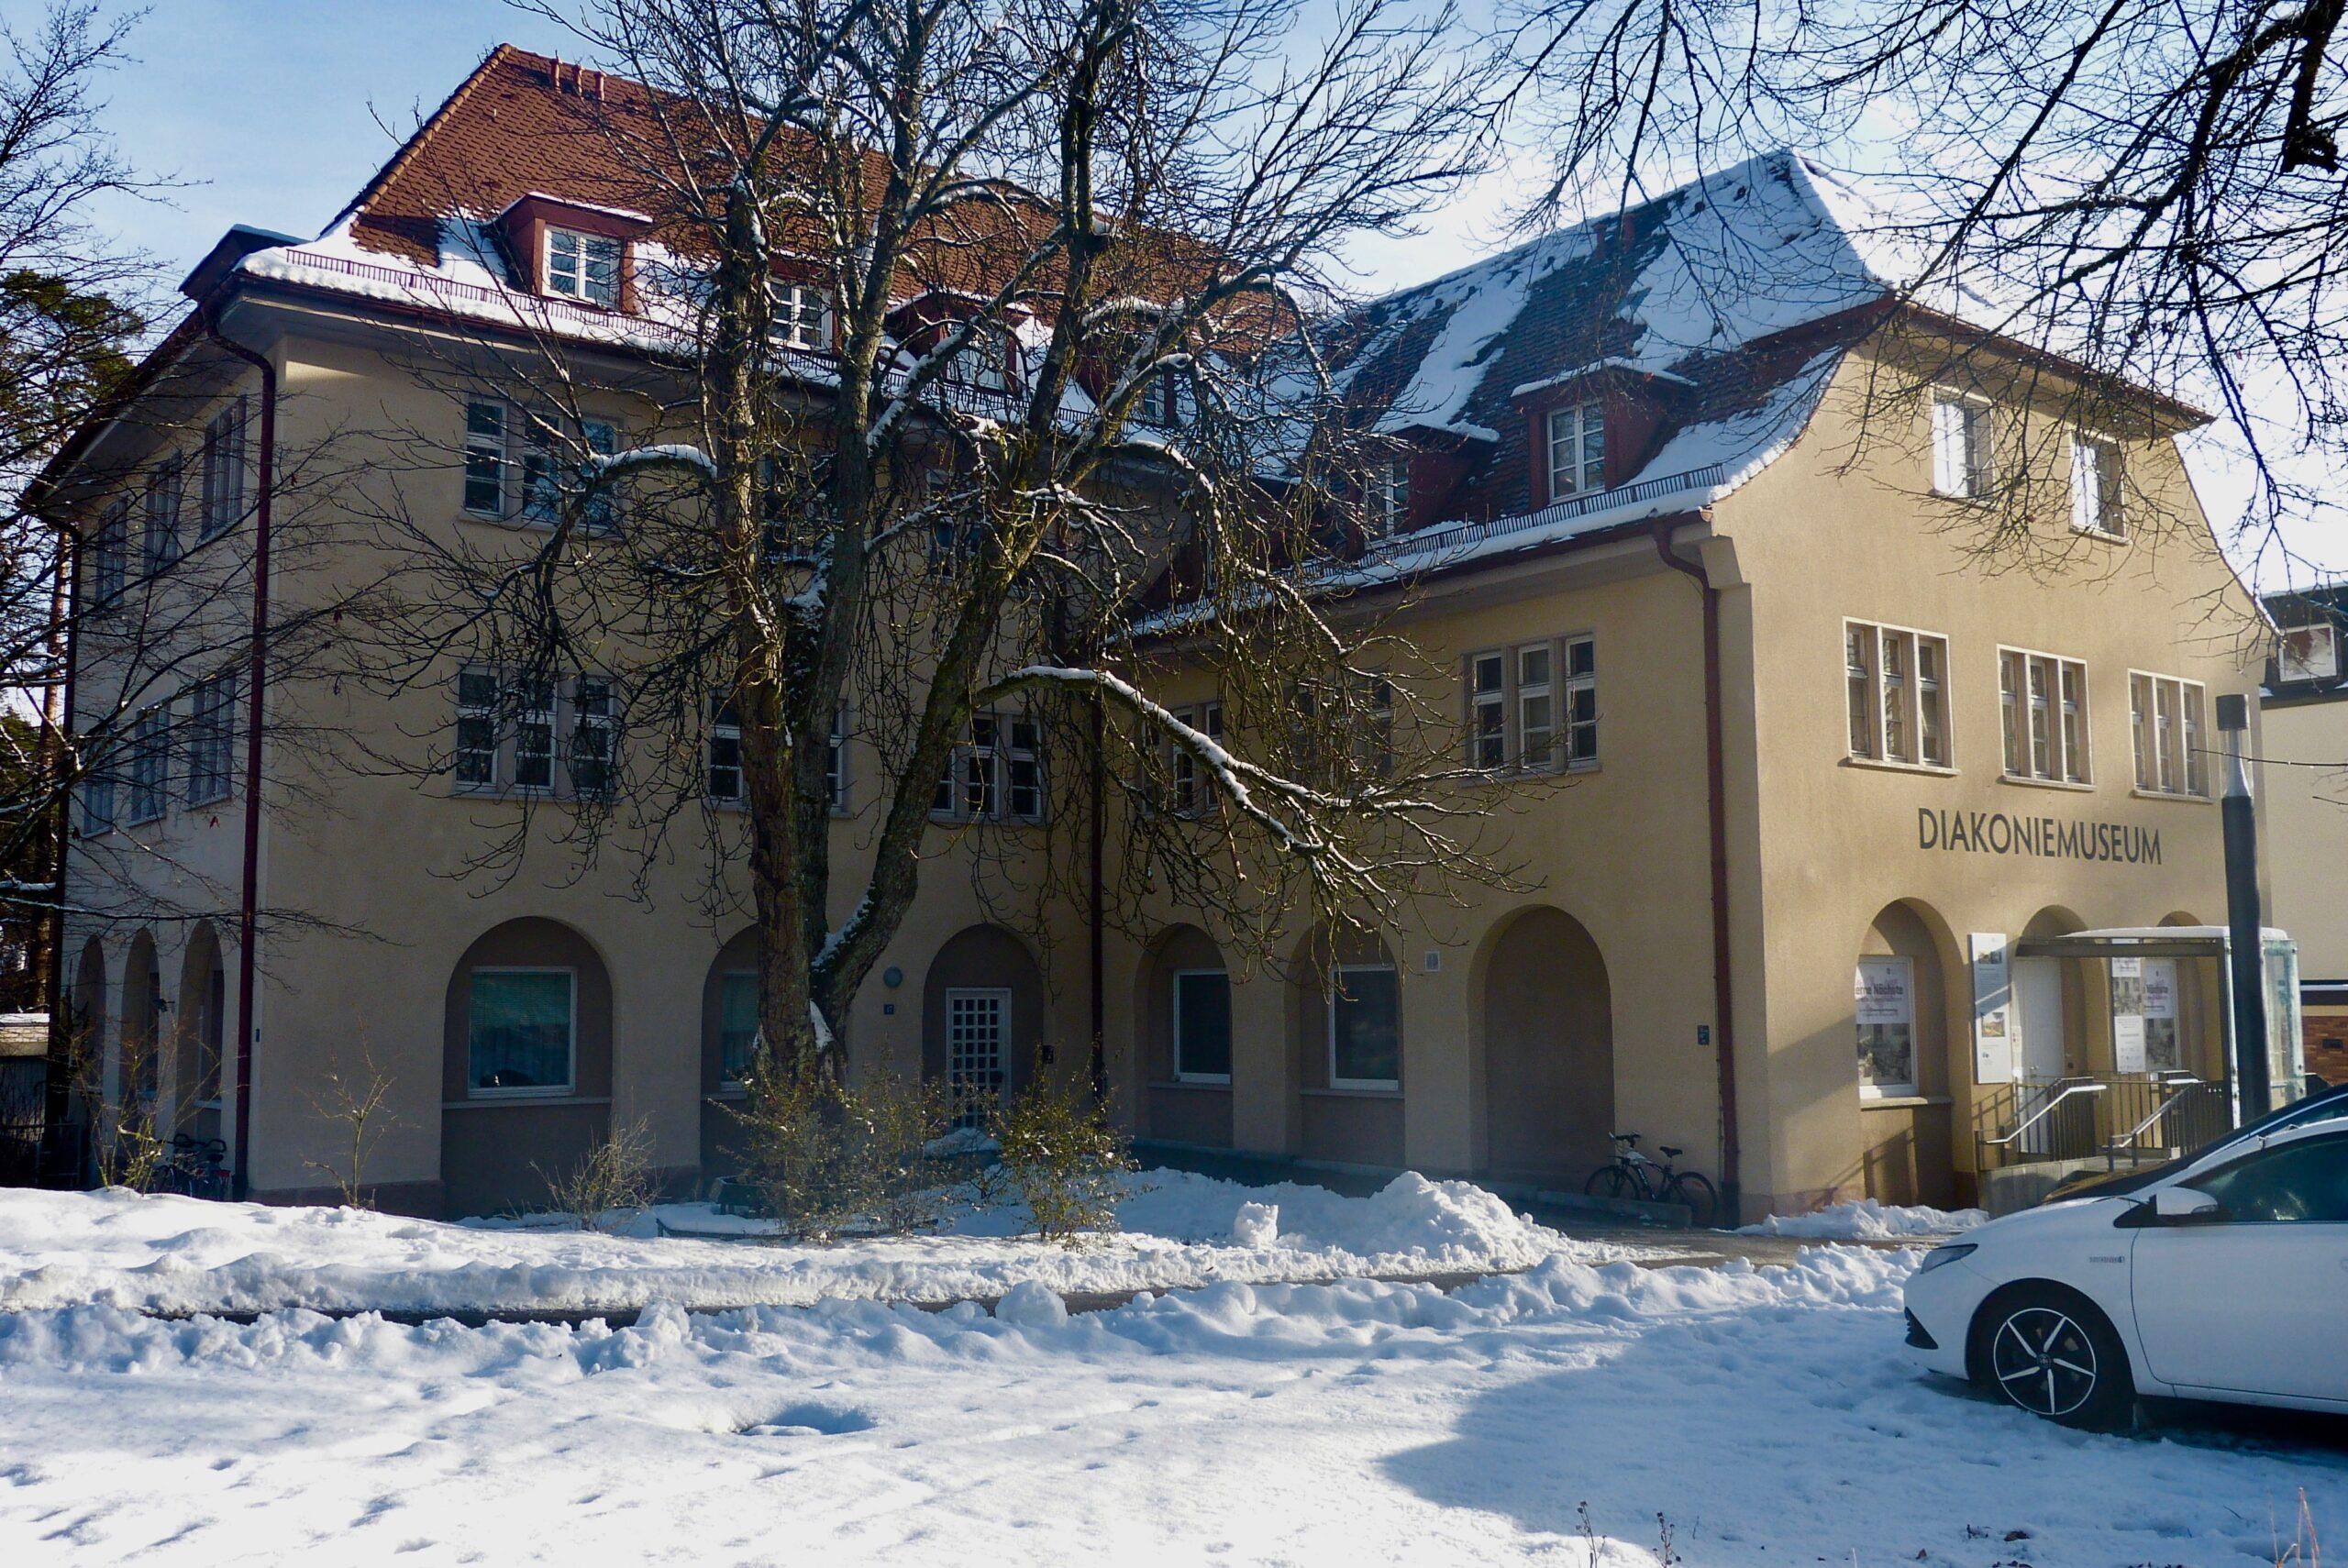 Heute ist das Haus Heimat des Diakoniemuseums